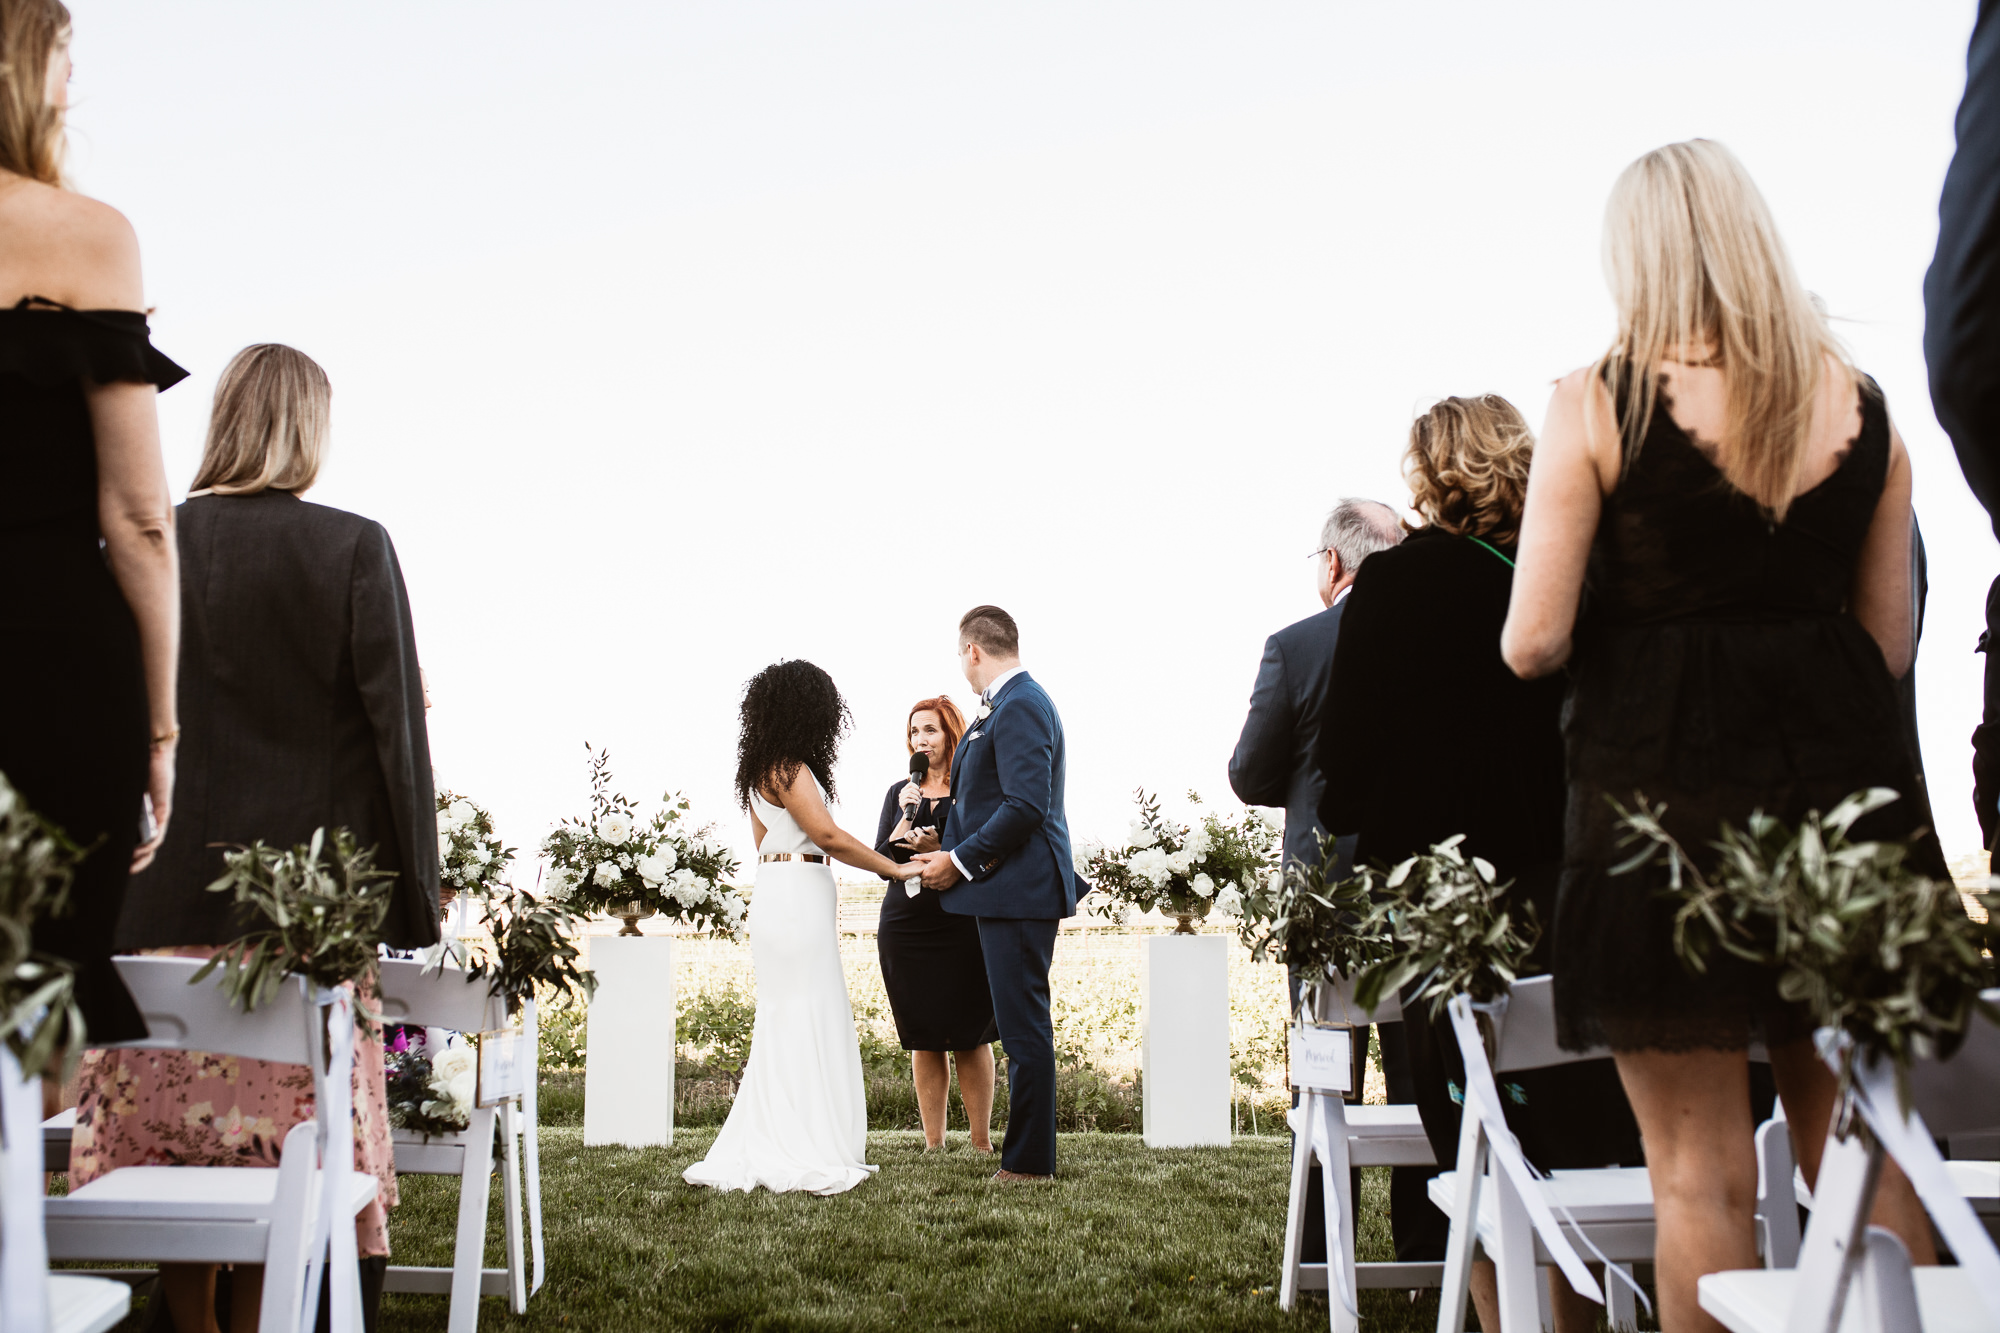 stratus-winery-wedding-vineyard-wedding-vineyard-bride-photo-by-reed-photography-040.jpg